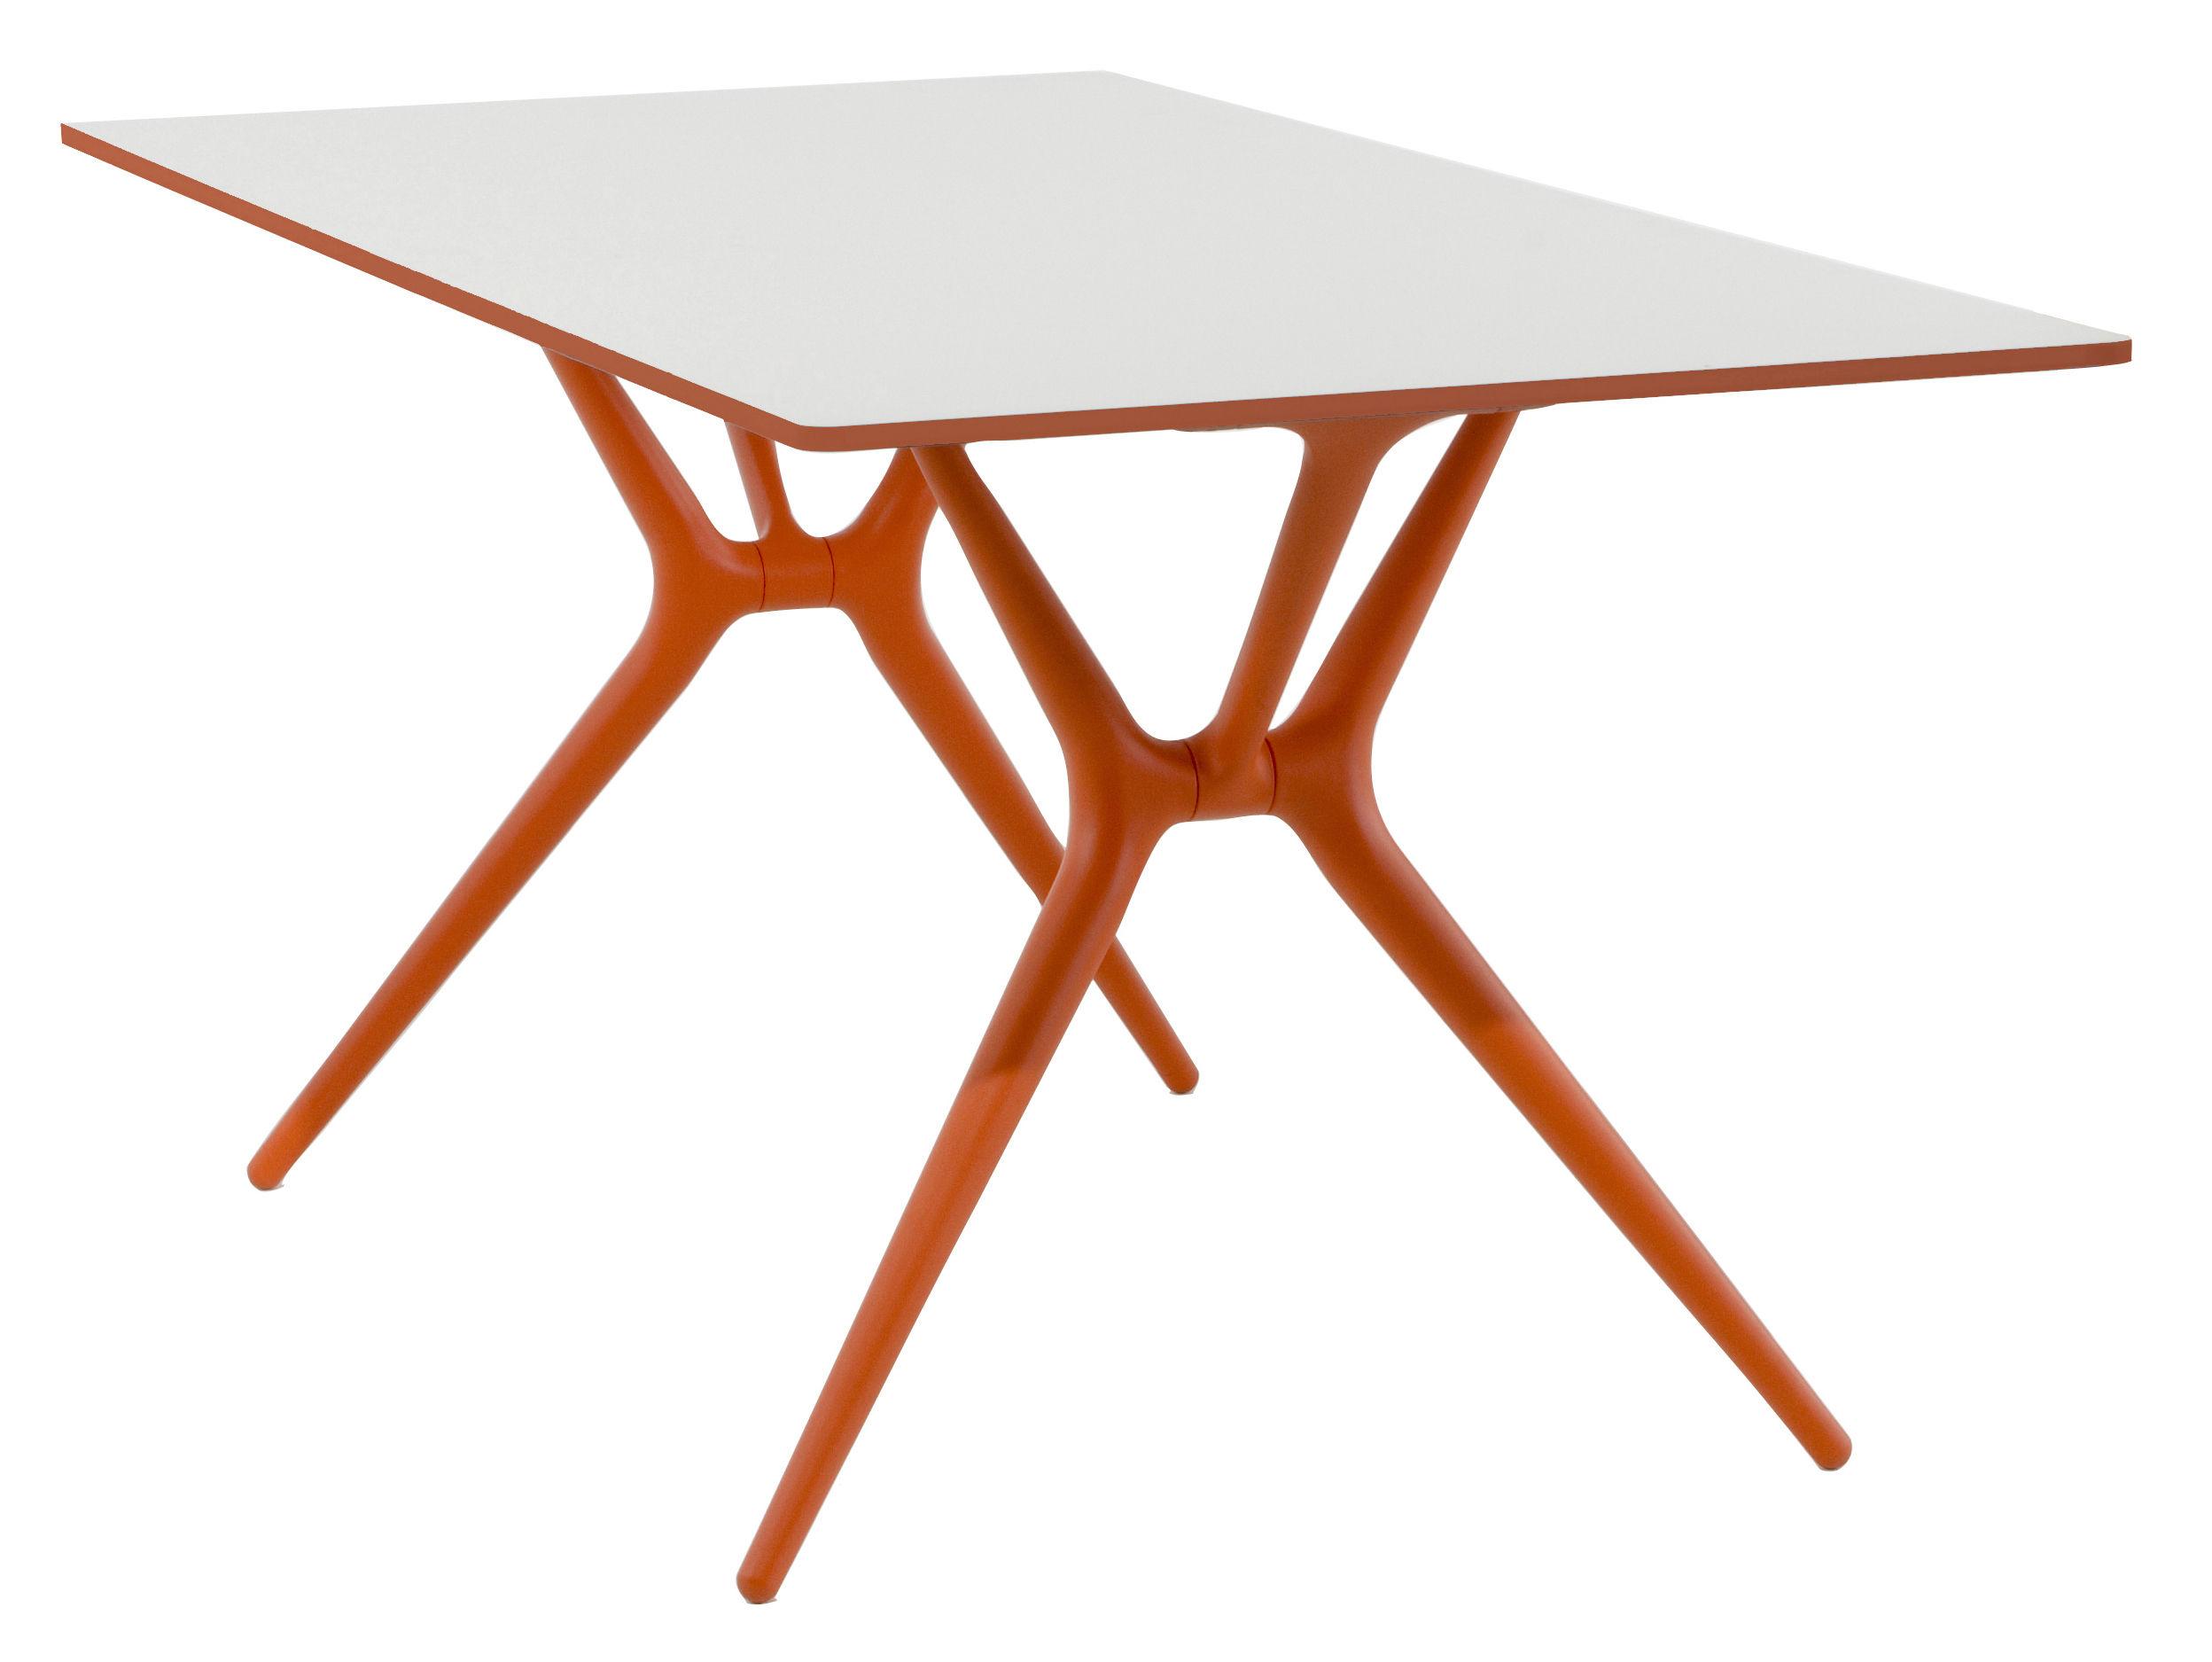 Made In Design Mobilier Contemporain Luminaire Et